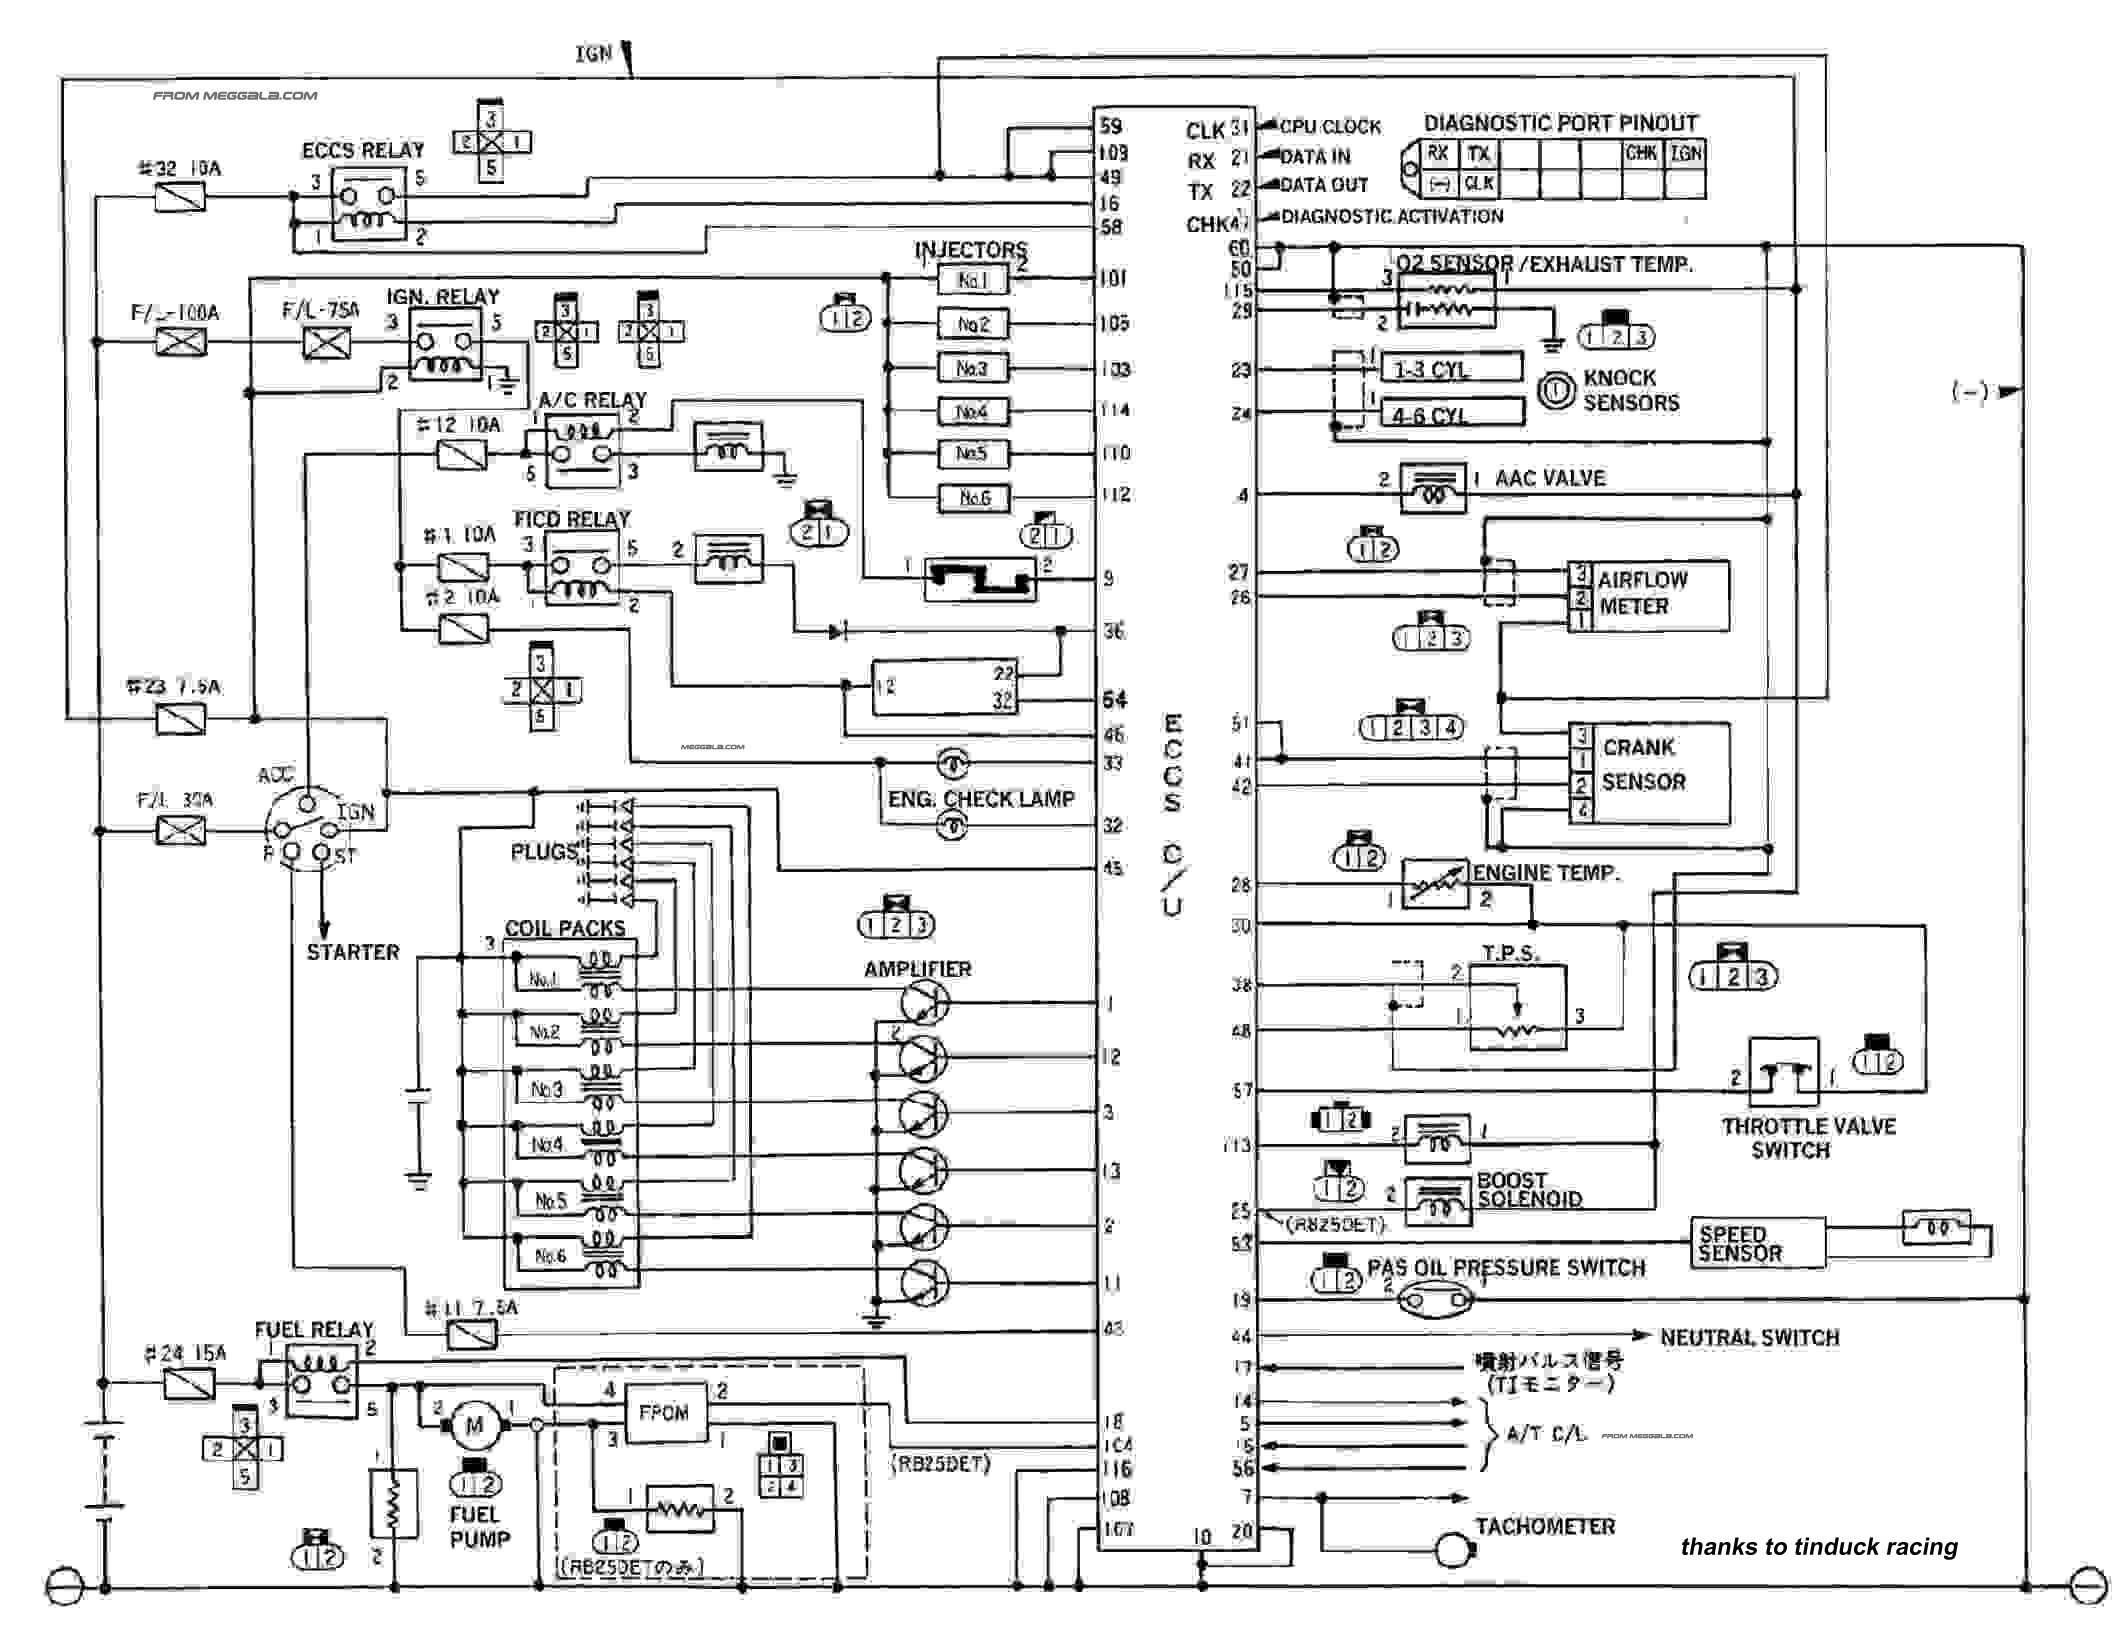 Detroit Series 60 Ecm Wiring Diagram R33 Rb25 Wiring Jpg and Ecm Diagram Wiring Diagrams Of Detroit Series 60 Ecm Wiring Diagram